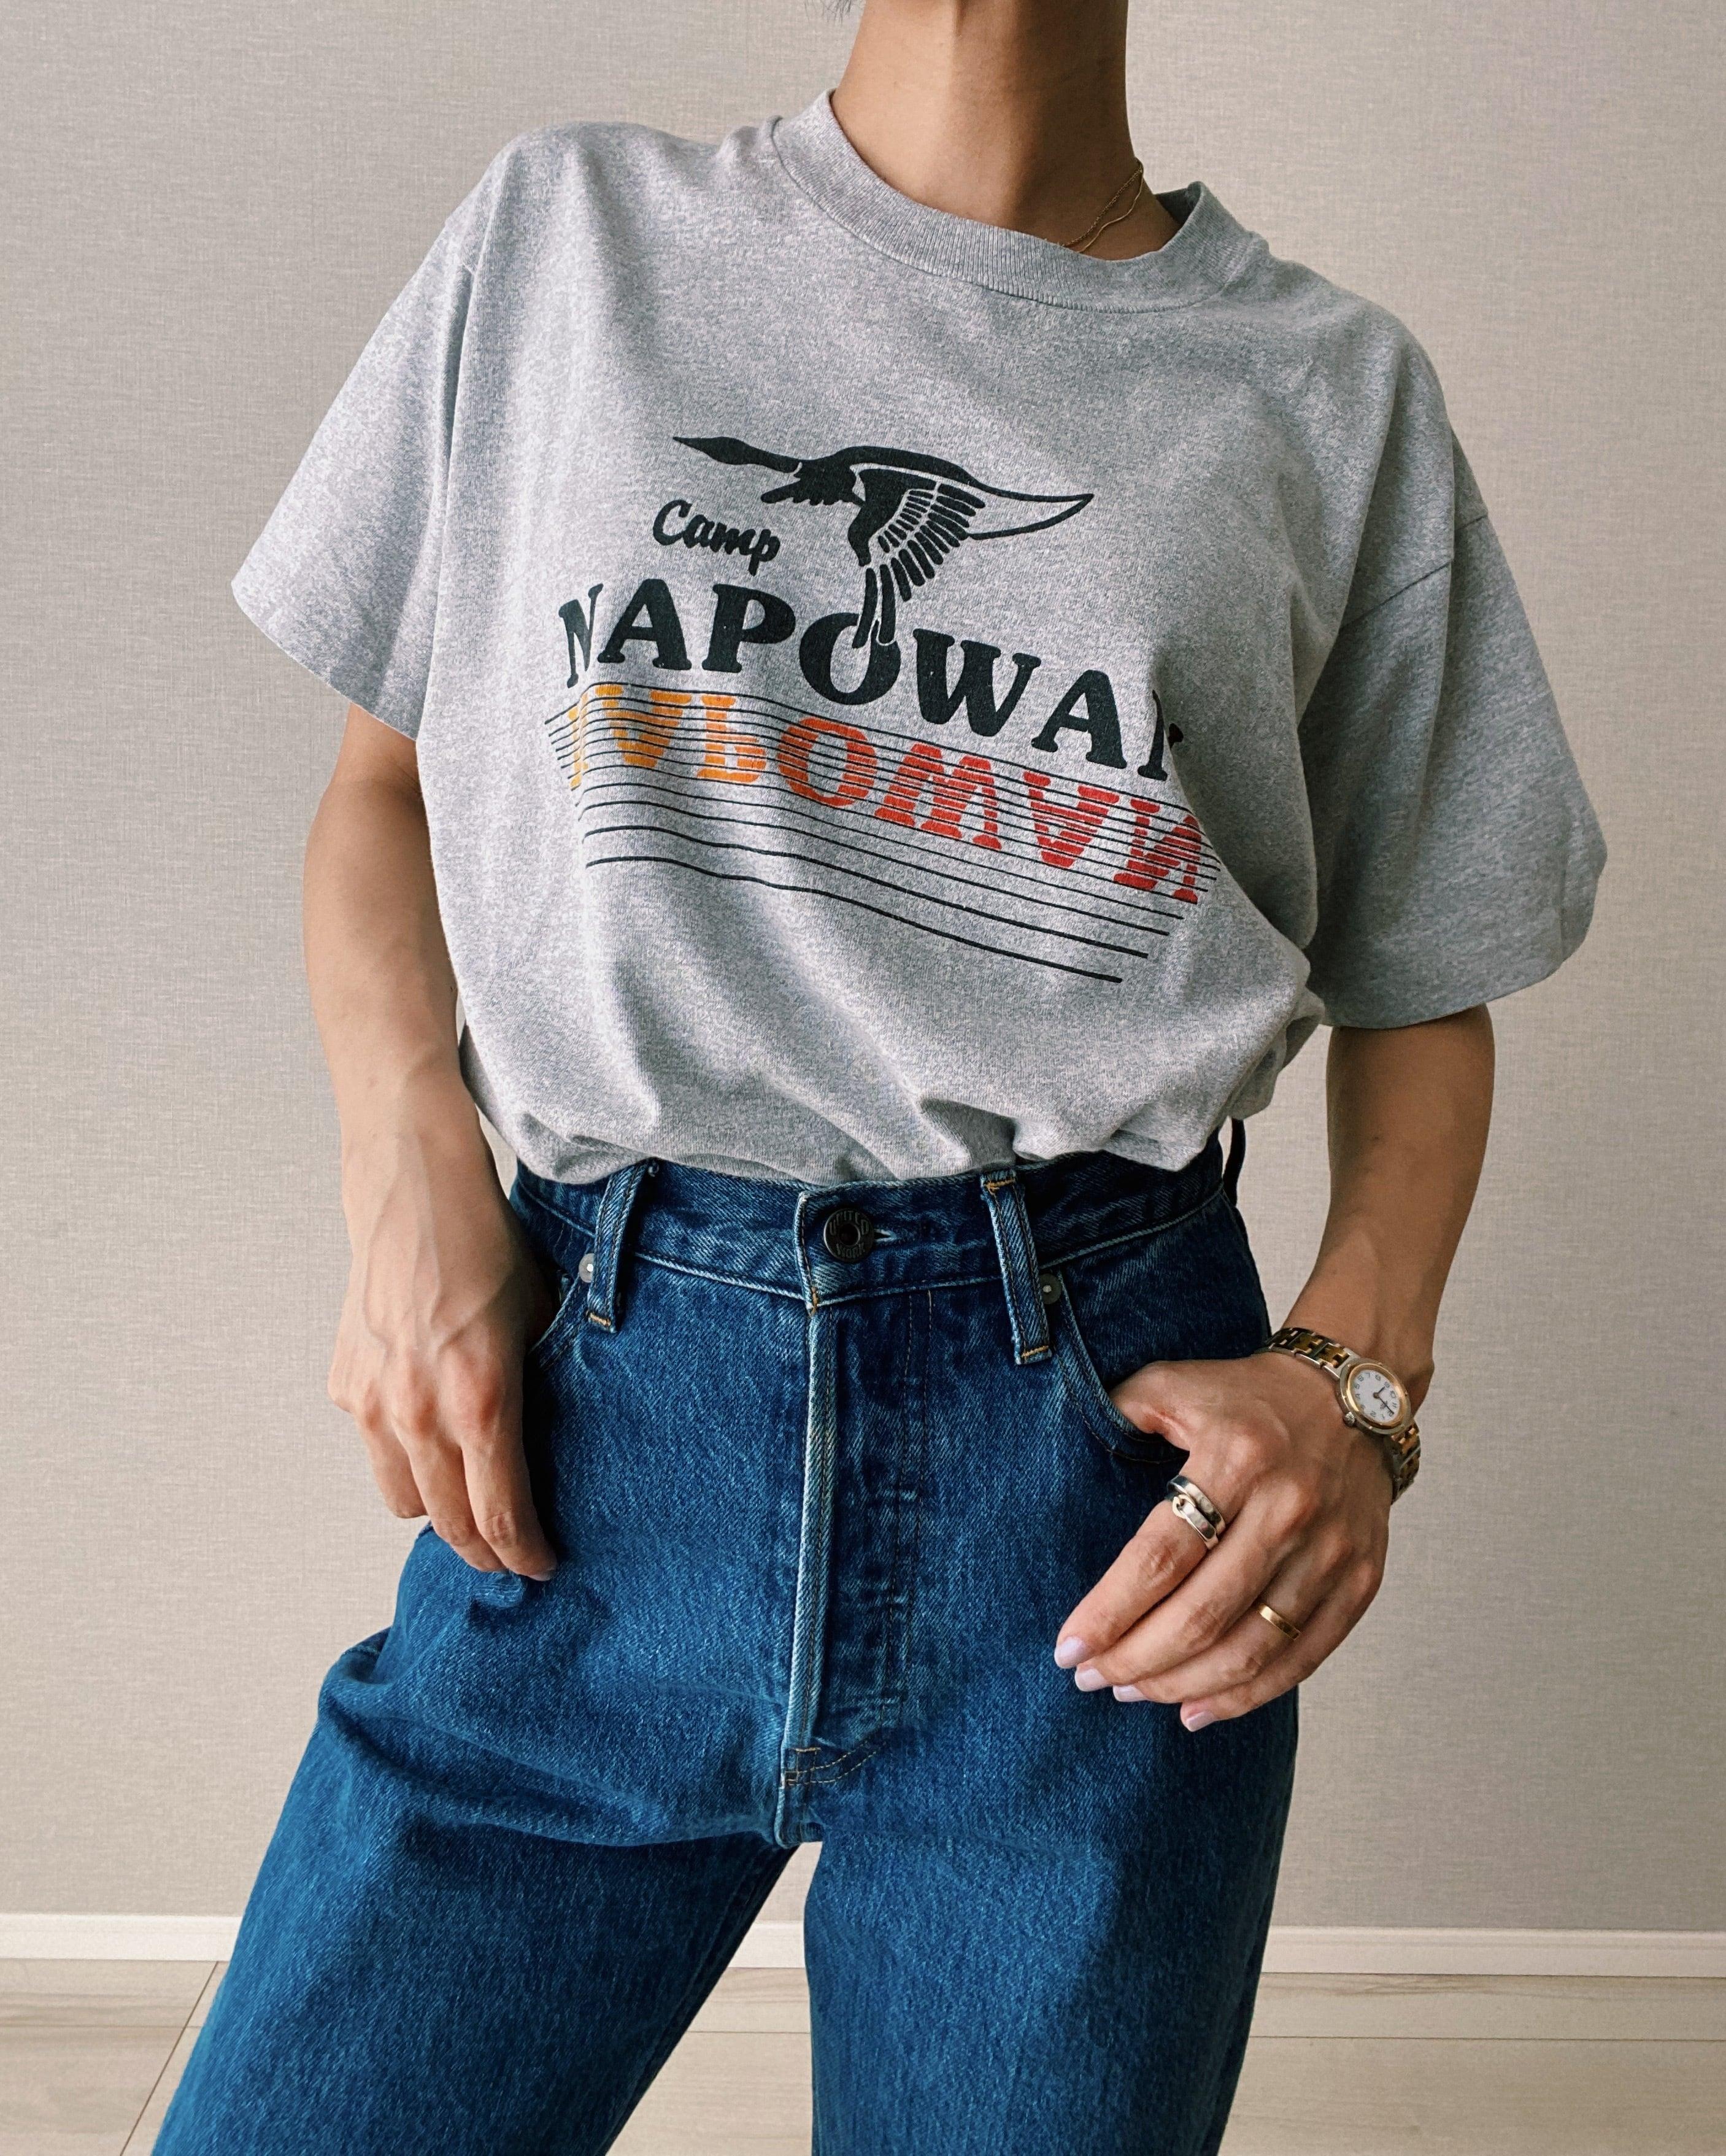 (CS348) Printed T-shirt made in USA